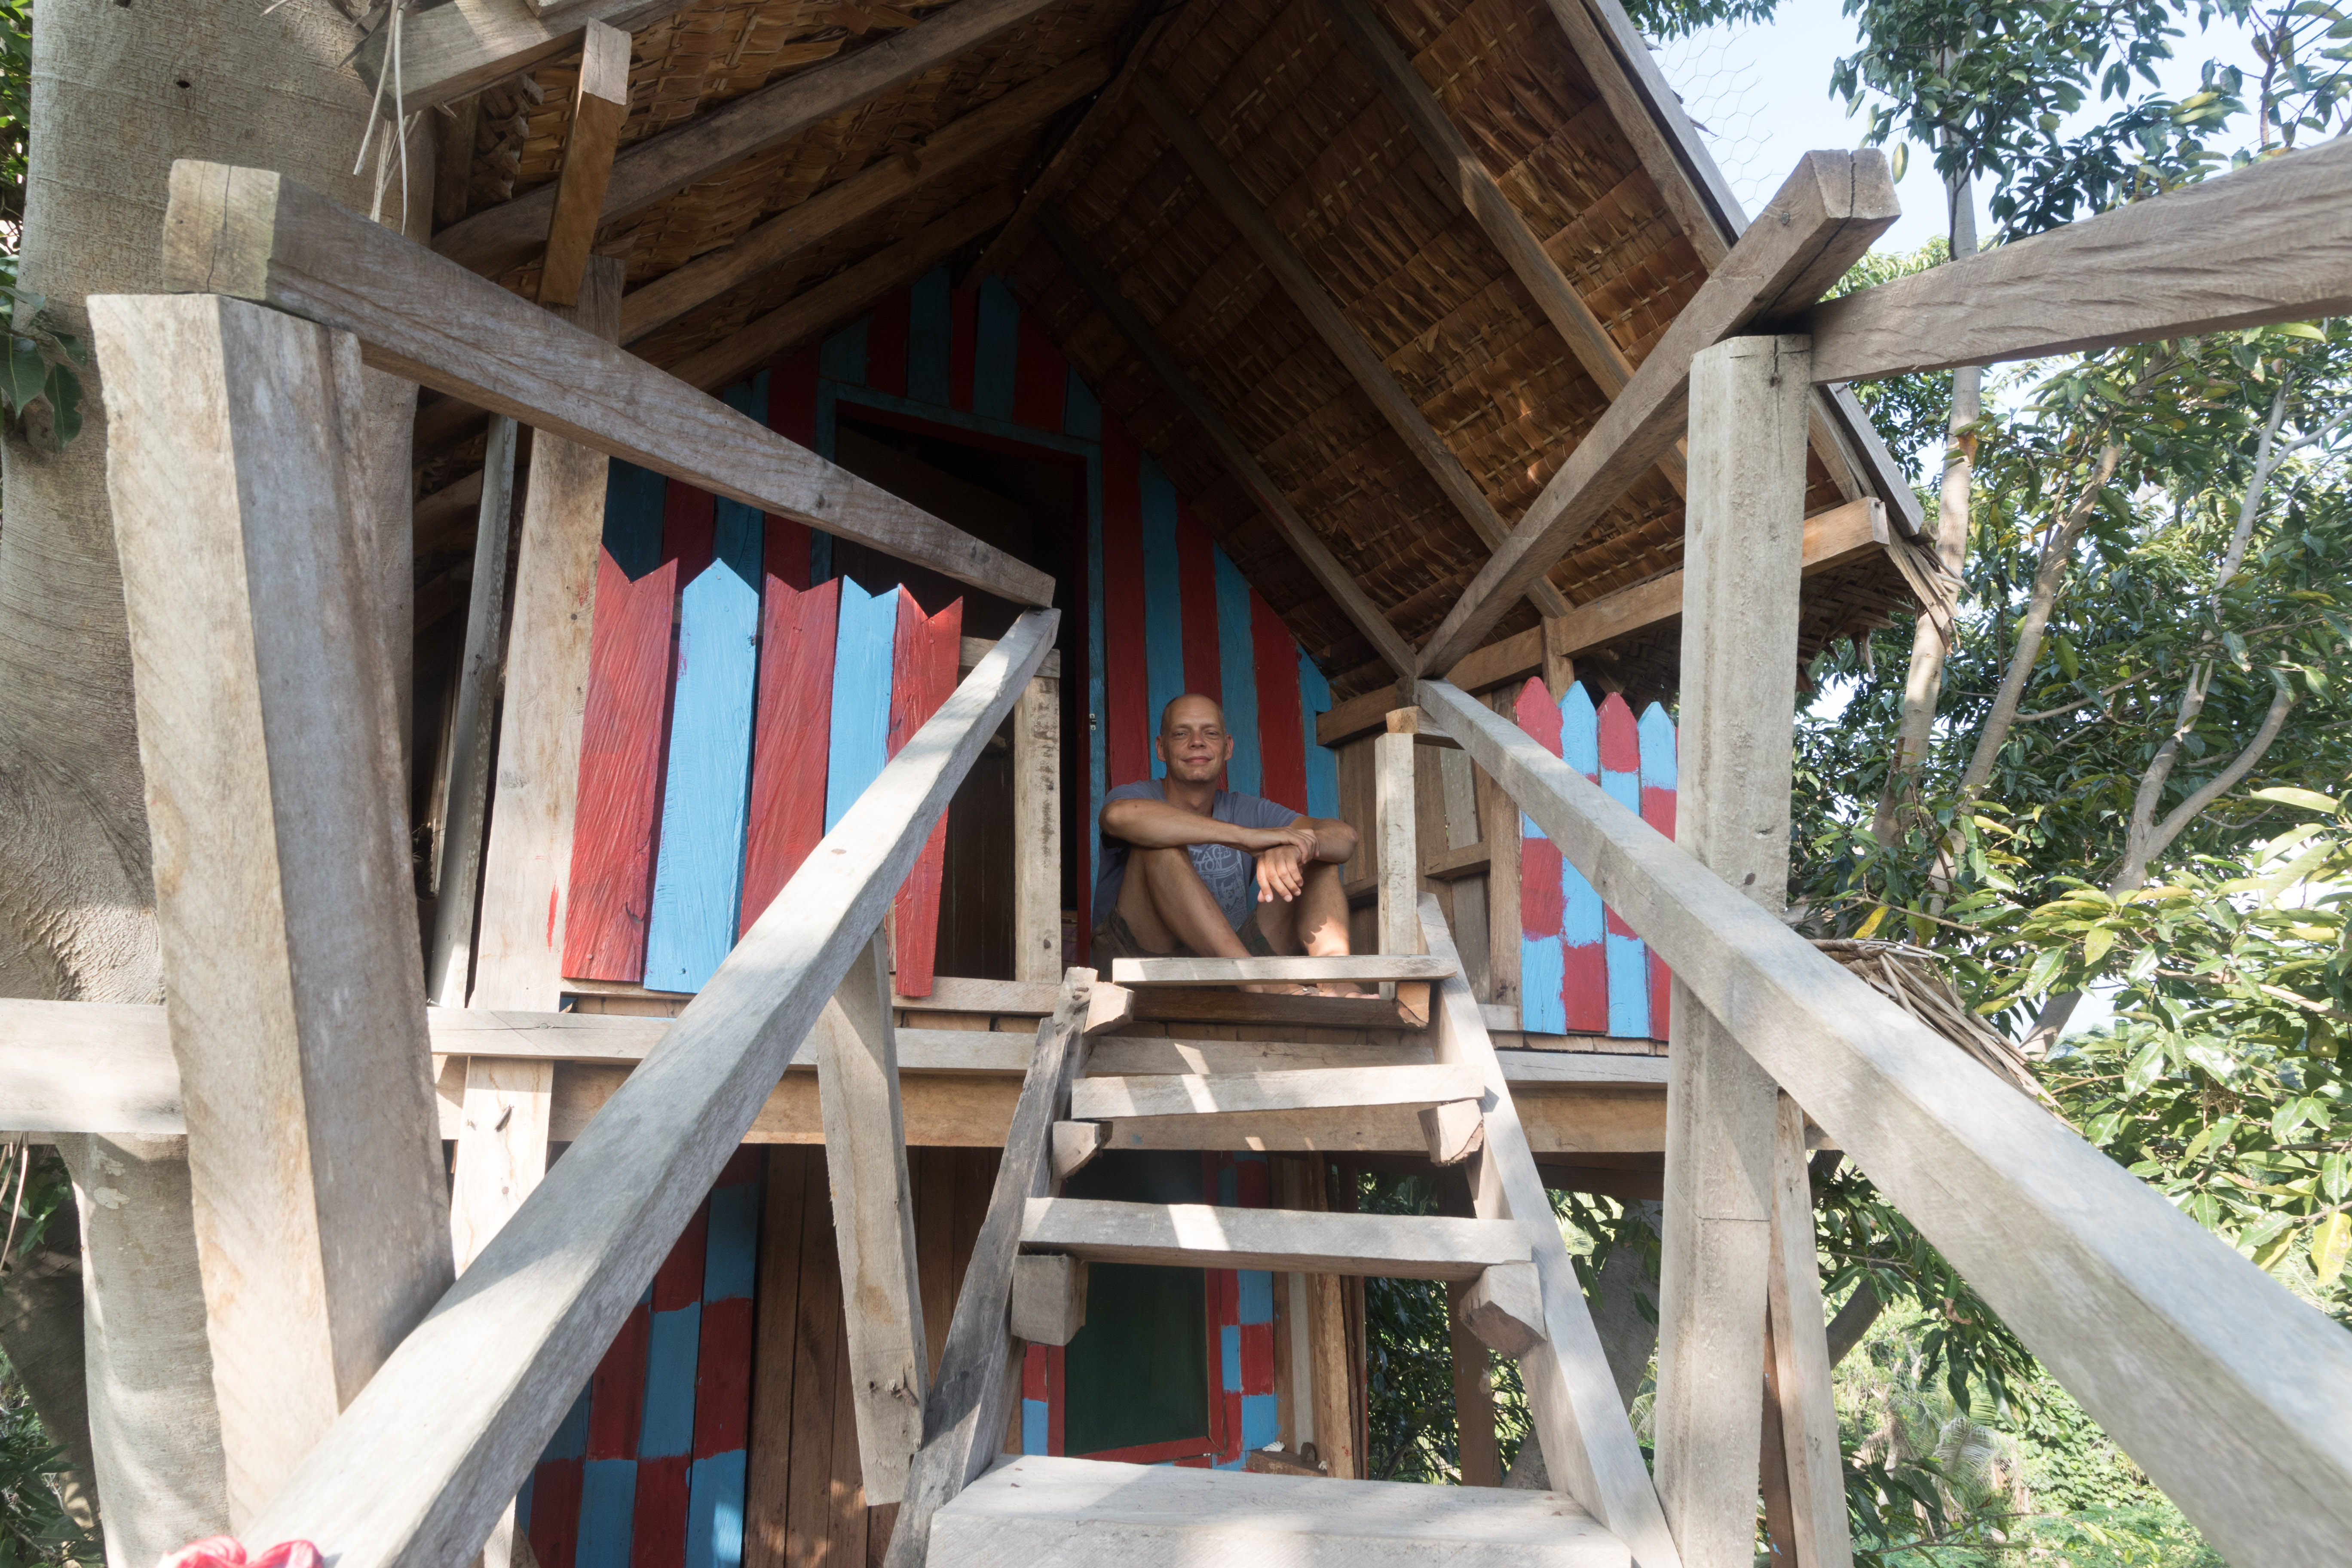 Yvonderweg - Avontuurlijk Tanna - Tom in boomhut Yasur View Lodge